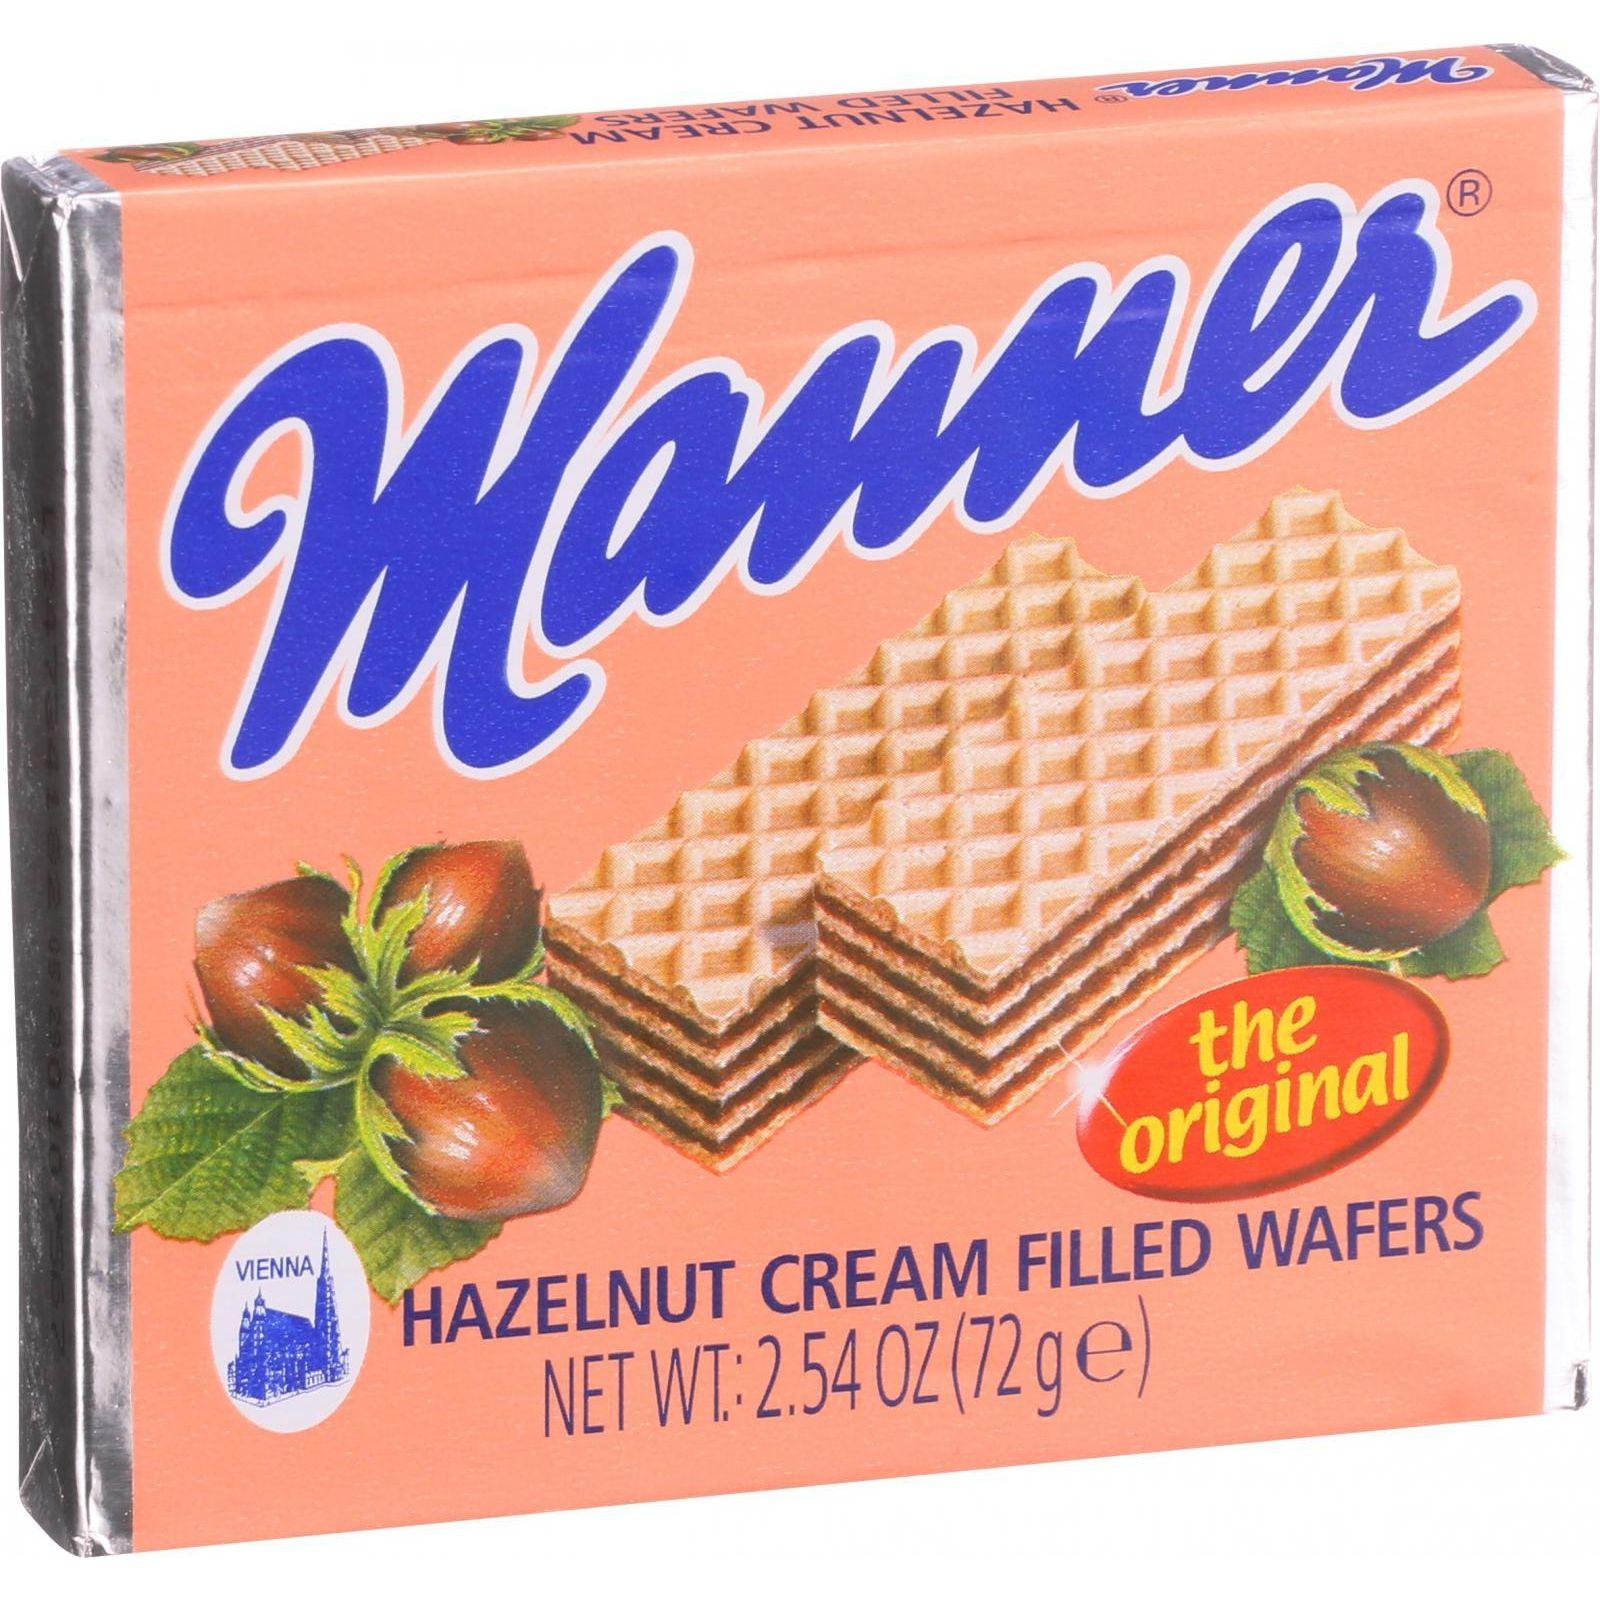 Manner Wafers - Hazelnut Cream Filled - 2.11 oz - Case of 12